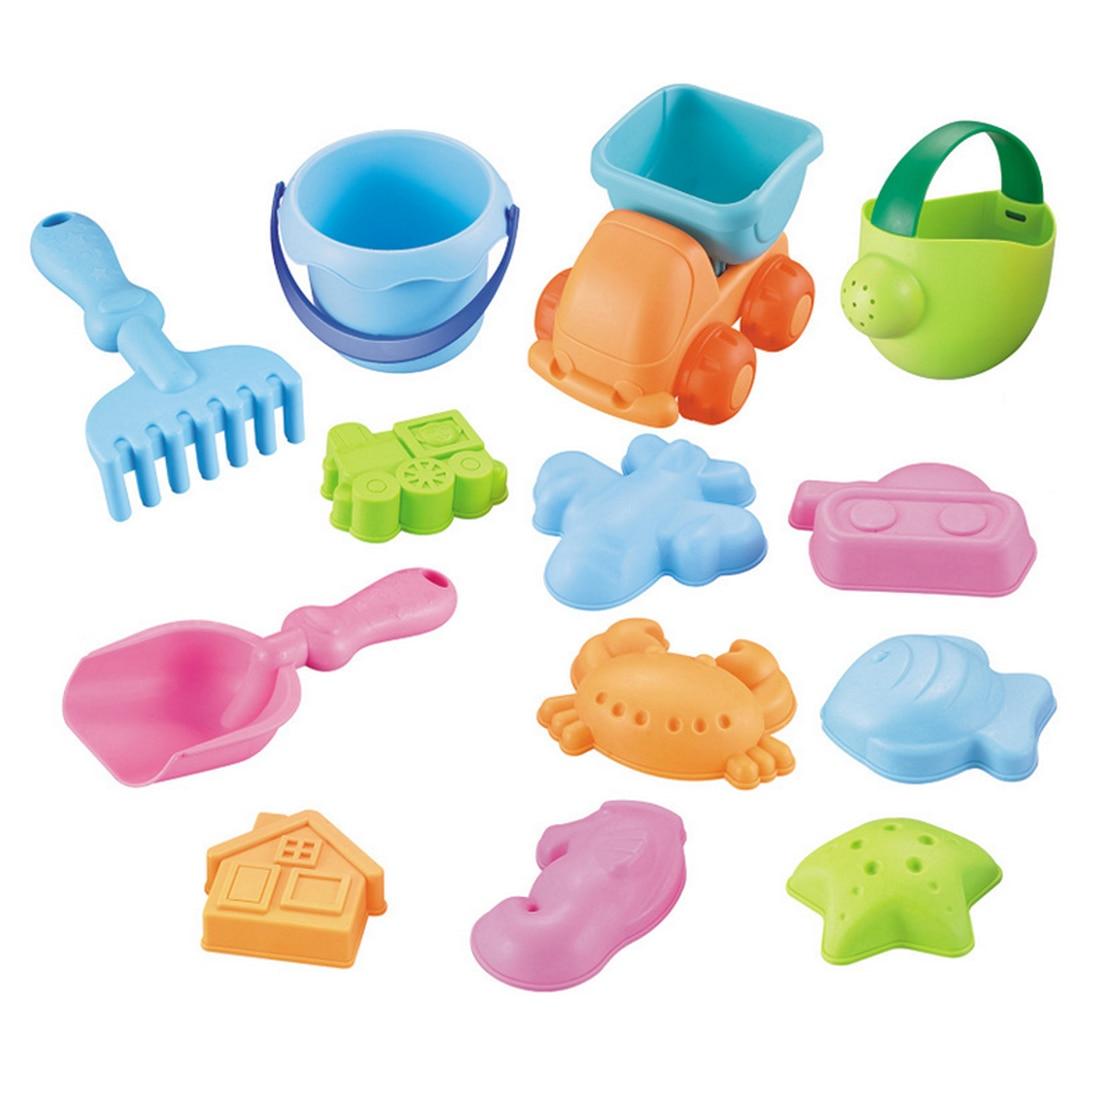 Reasonable 13pcs Beach Sand Toy Set Bucket Shovels Watering Can Children Safety Soft Plastic Toys Color Random Fancy Colours Toys & Hobbies Beach/sand Toys